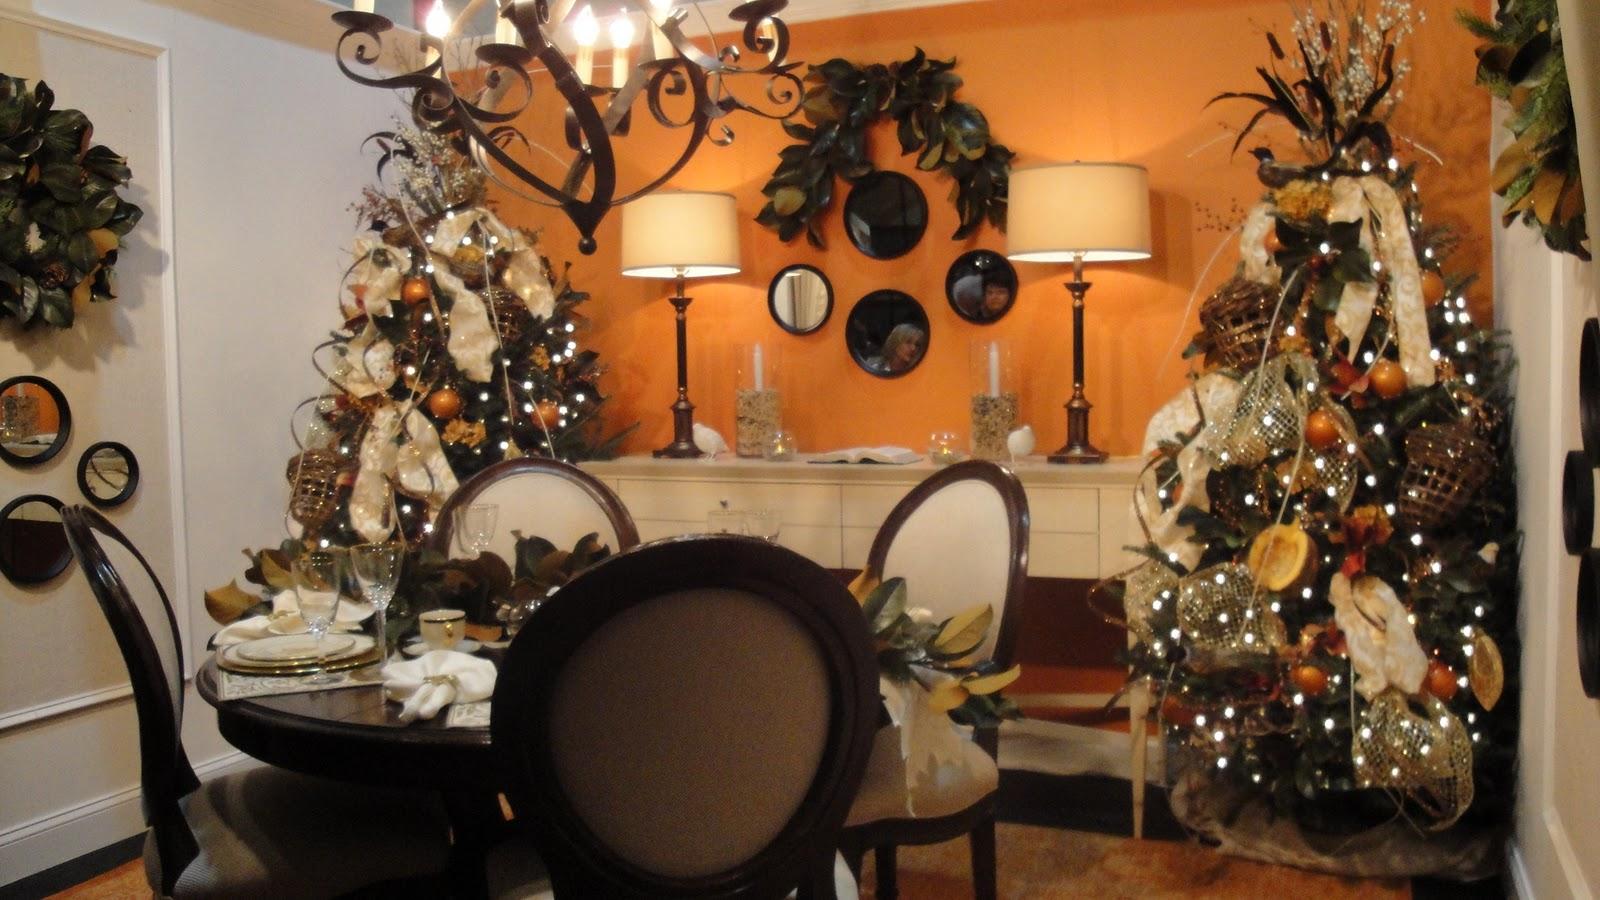 Southern Christmas Show 2011 - Charlotte, NC - New South Home